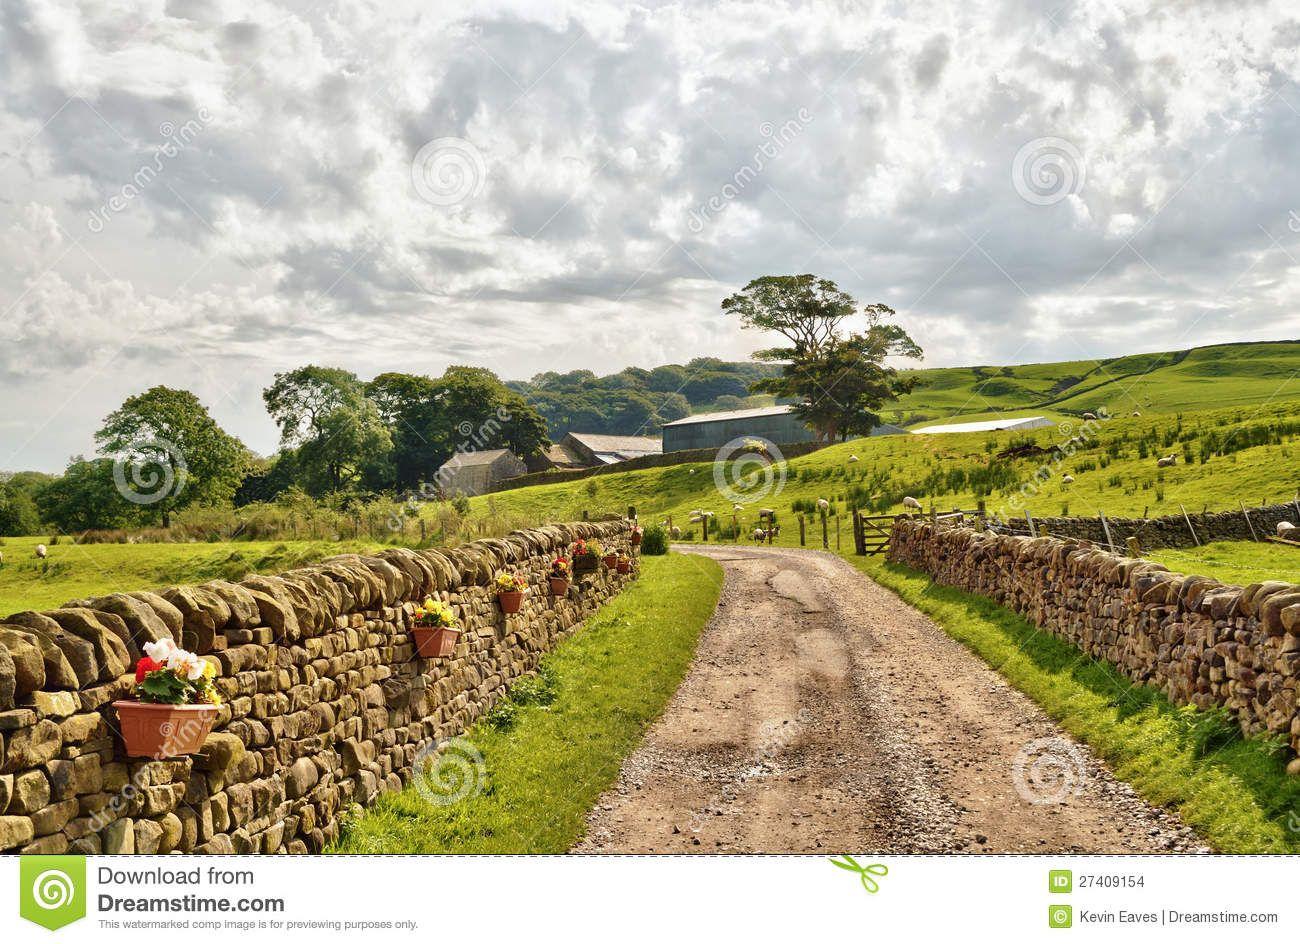 country-lane-bordered-stone-walls-fields-27409154.jpg (1300×944)